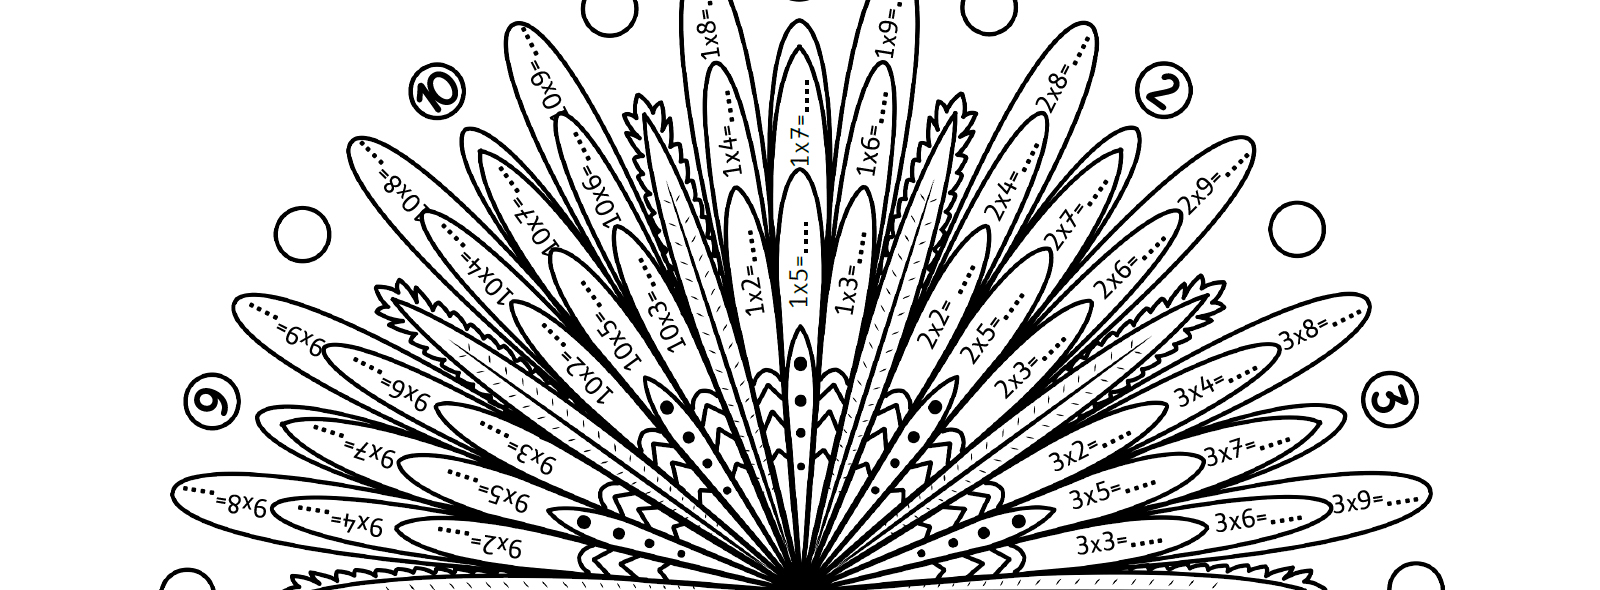 Mes Mandalas Des Tables De Multiplication La Taniere De Kyban